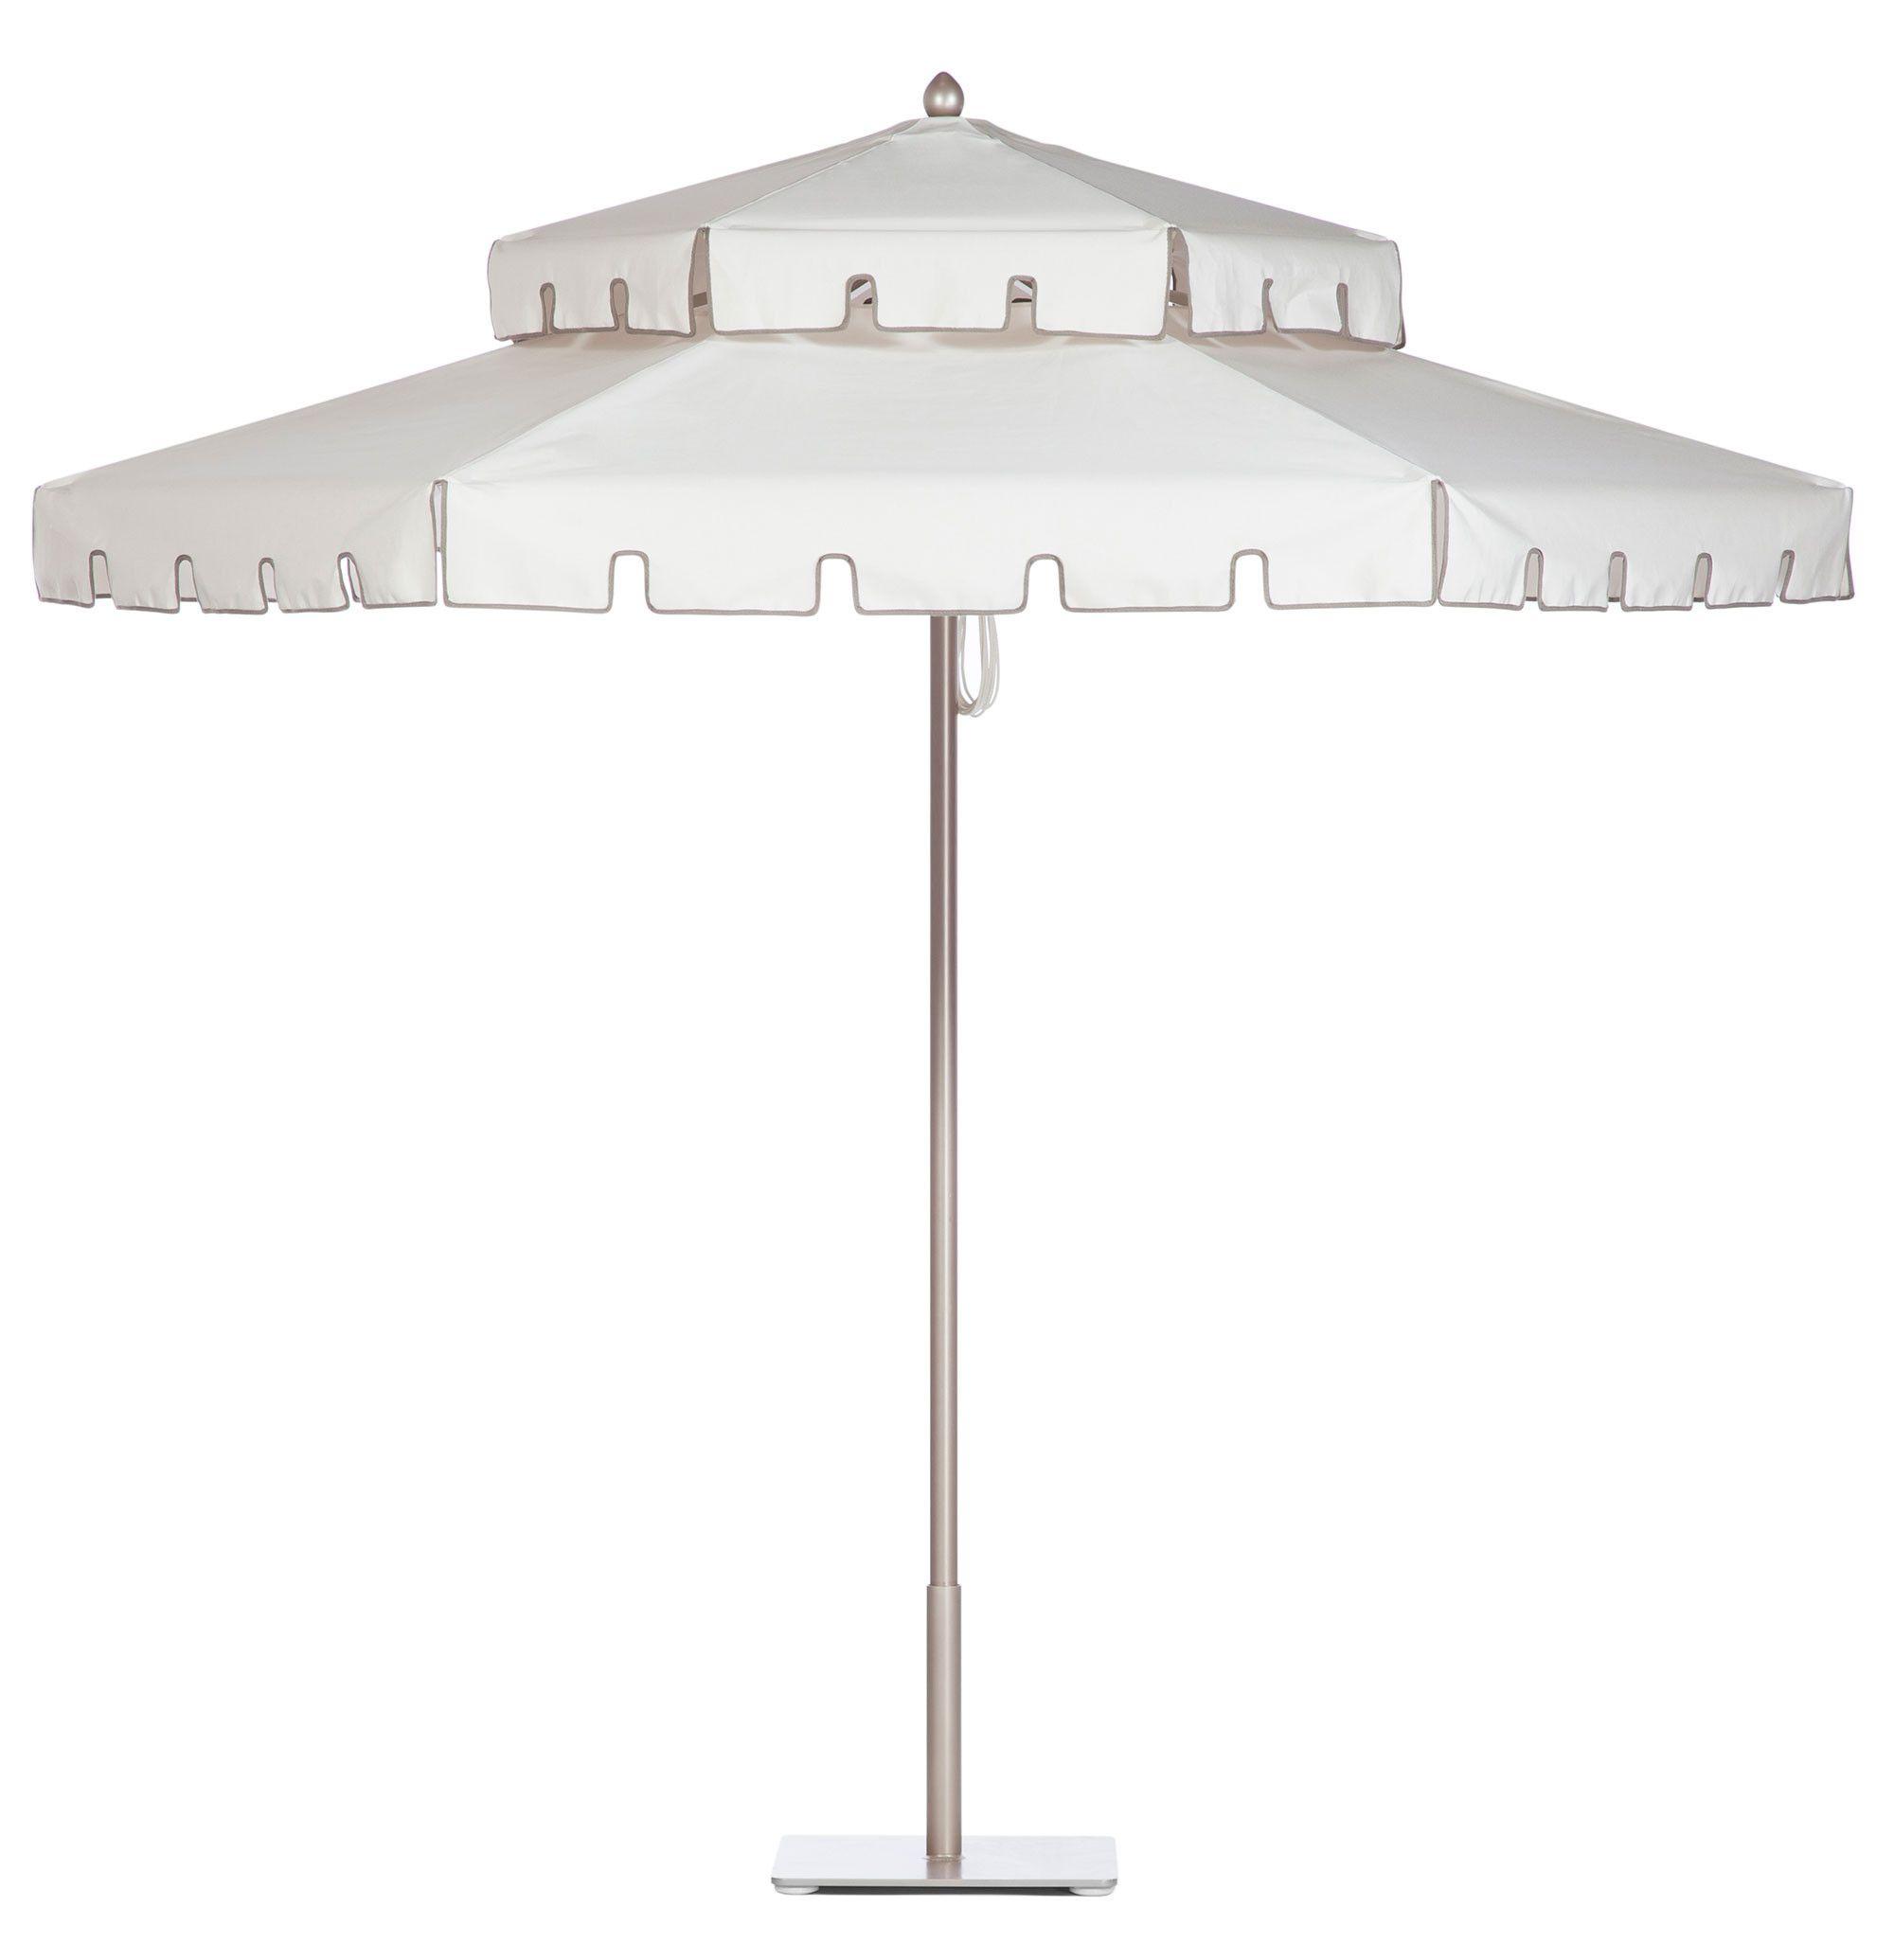 Double Decker Hexagon Umbrella With Keyhole Valance